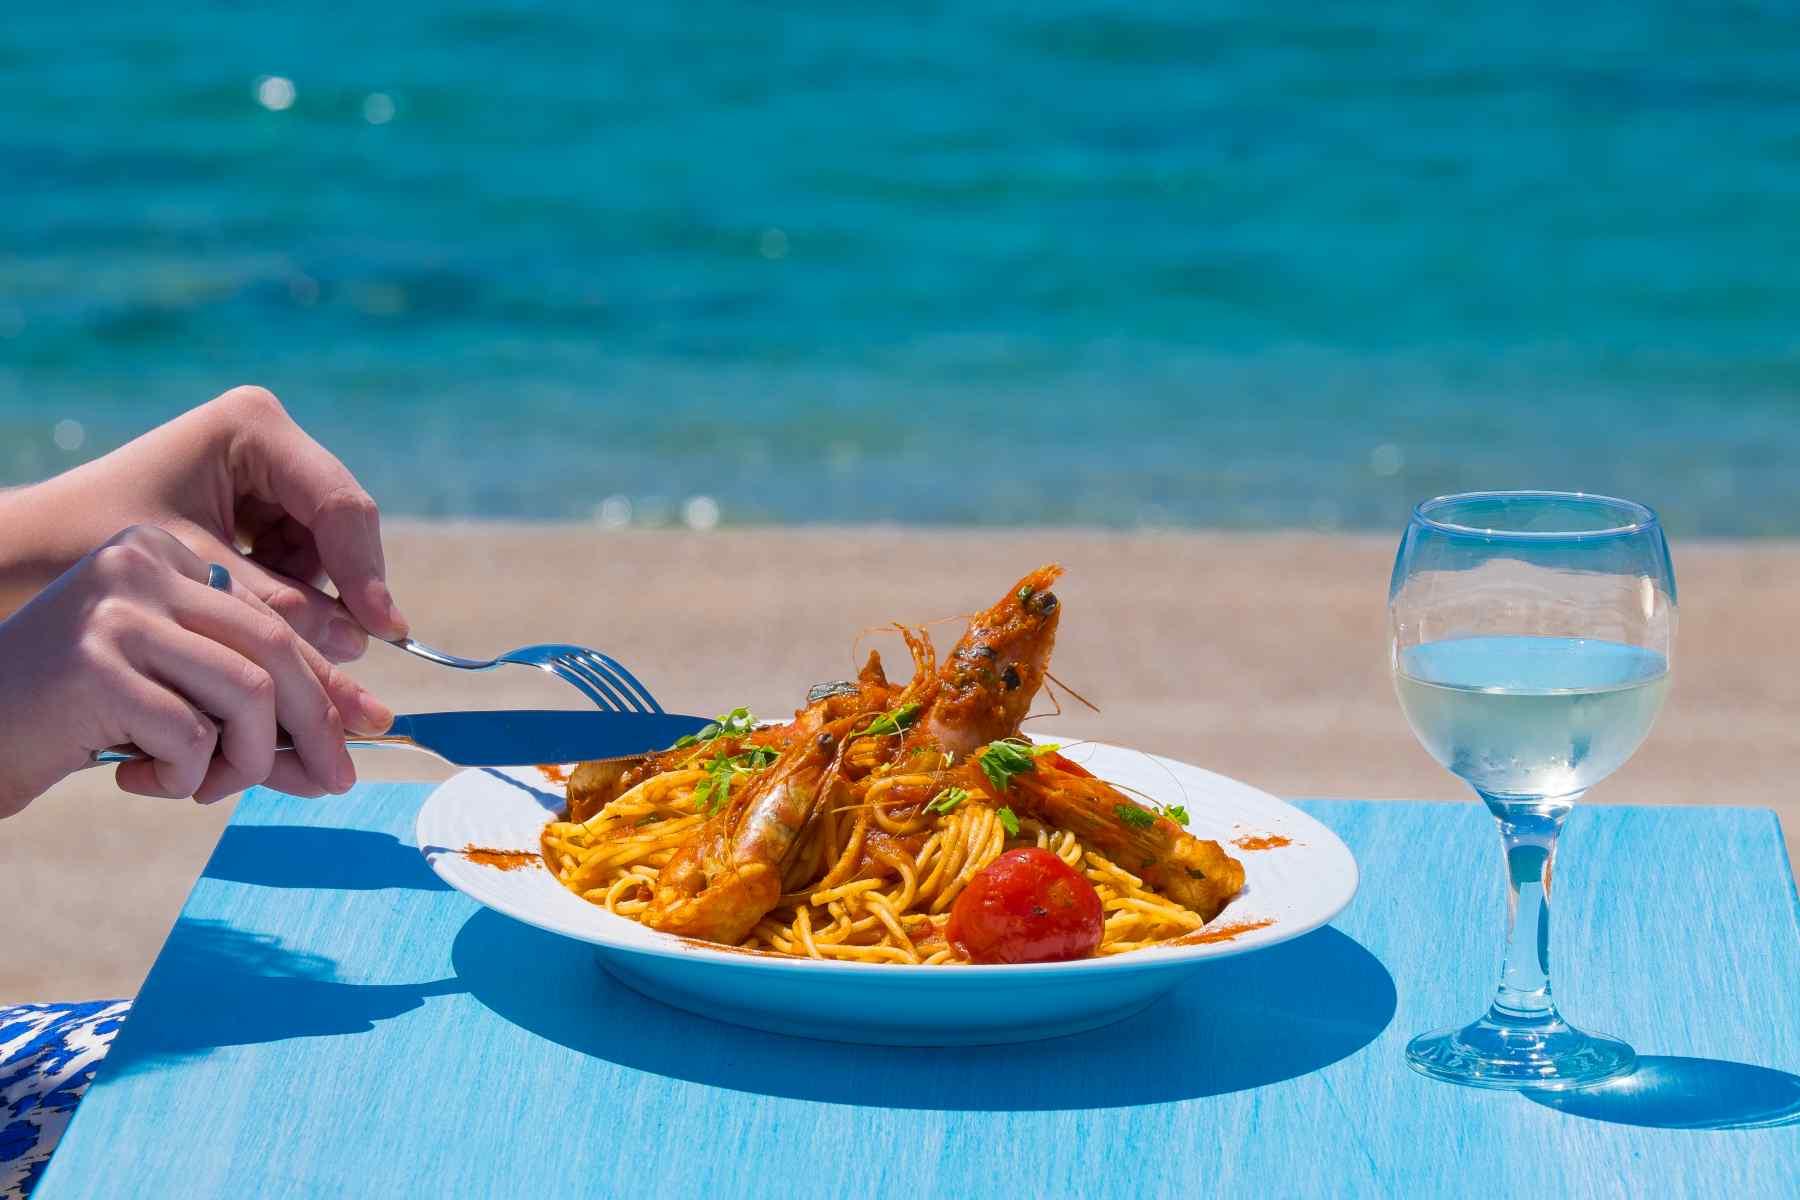 Must Boutique Hotel, Ξενοδοχείο στο Κανάλι Πρέβεζας, Εστιατόριο στην αμμουδια με θαλασσινα από τον Αμβρακικό